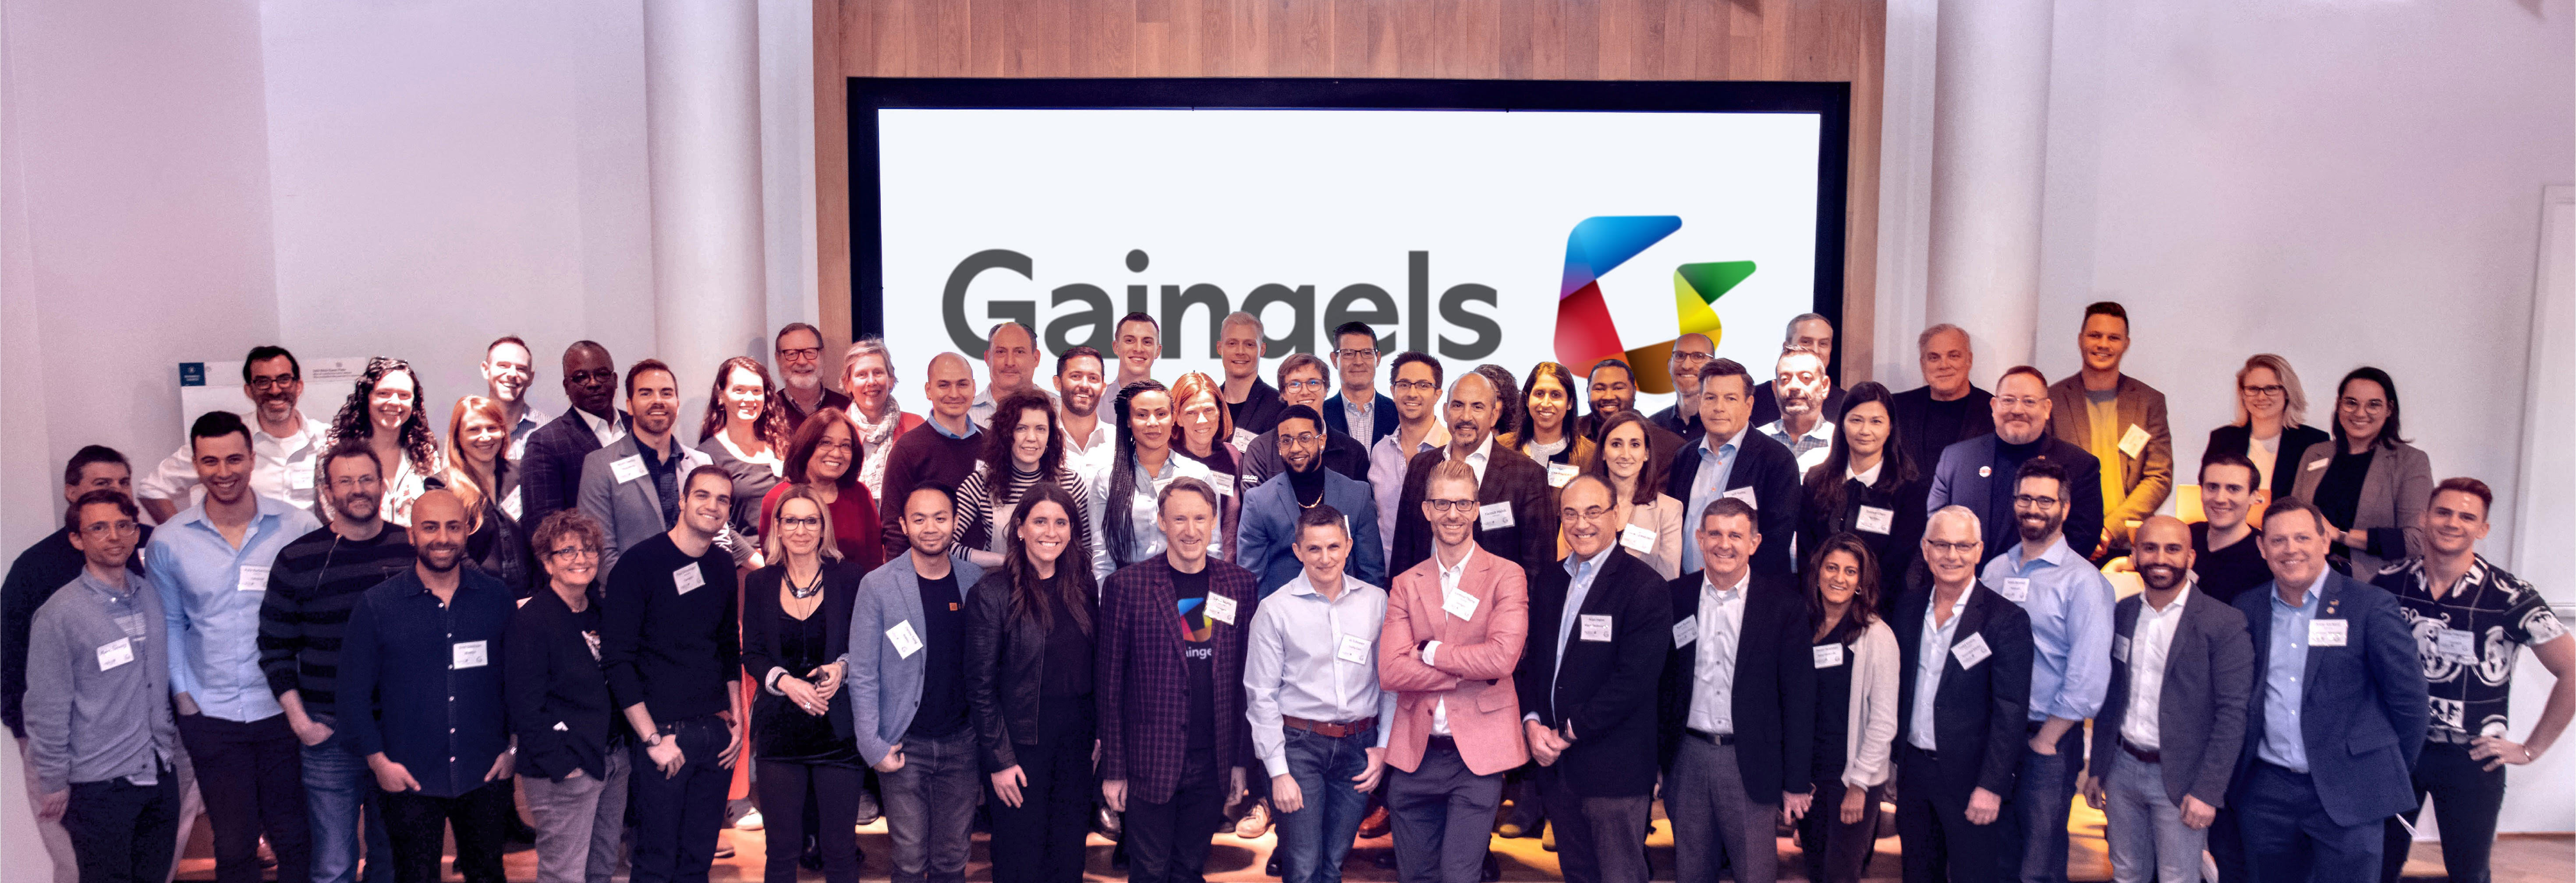 the giangels membership network